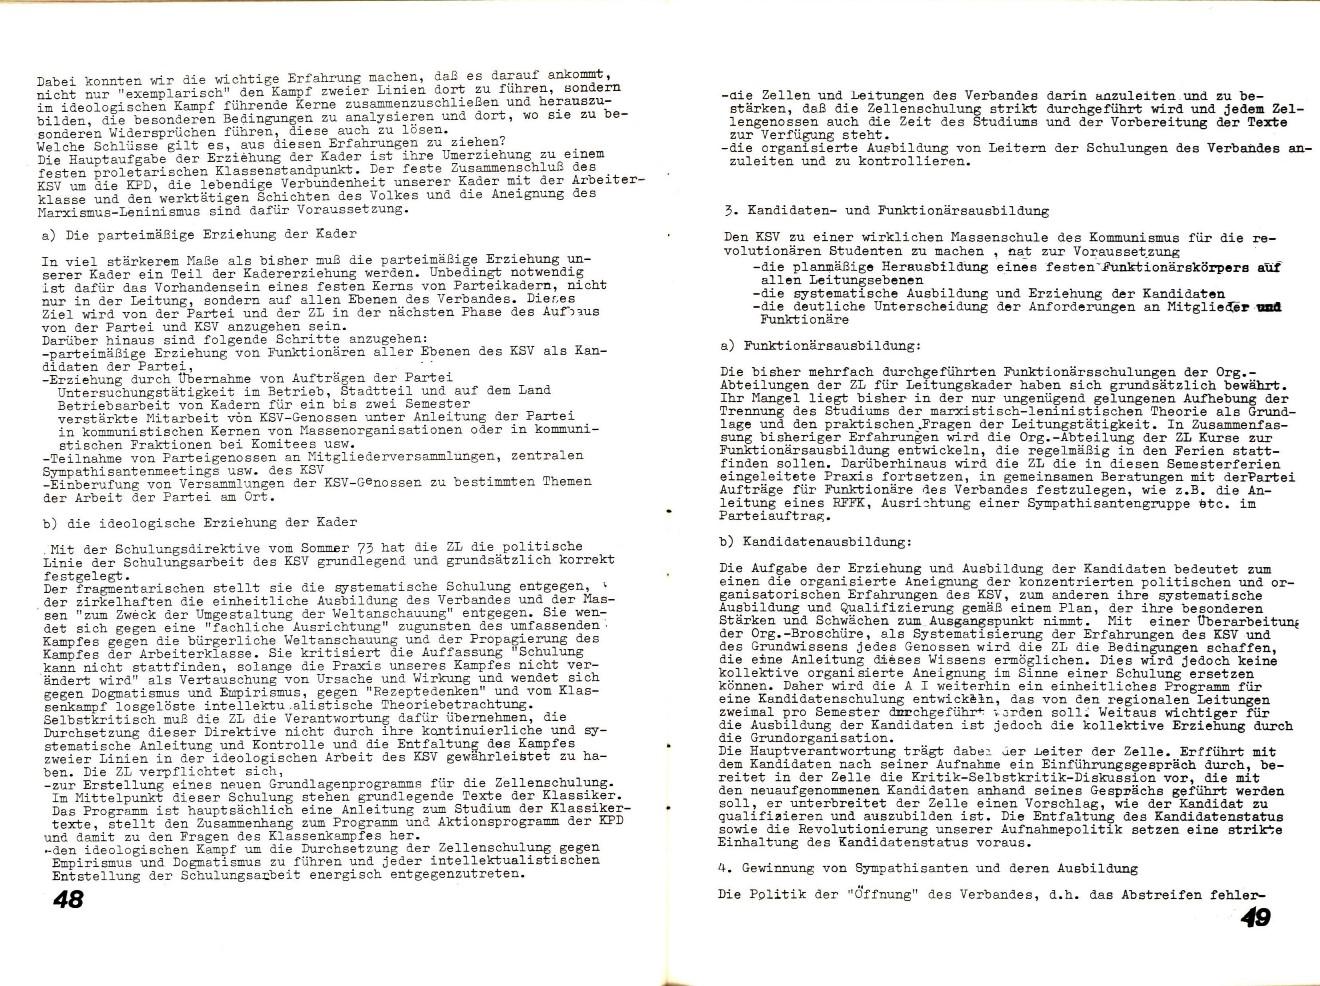 KSV_1974_Rechenschaftsbericht_26